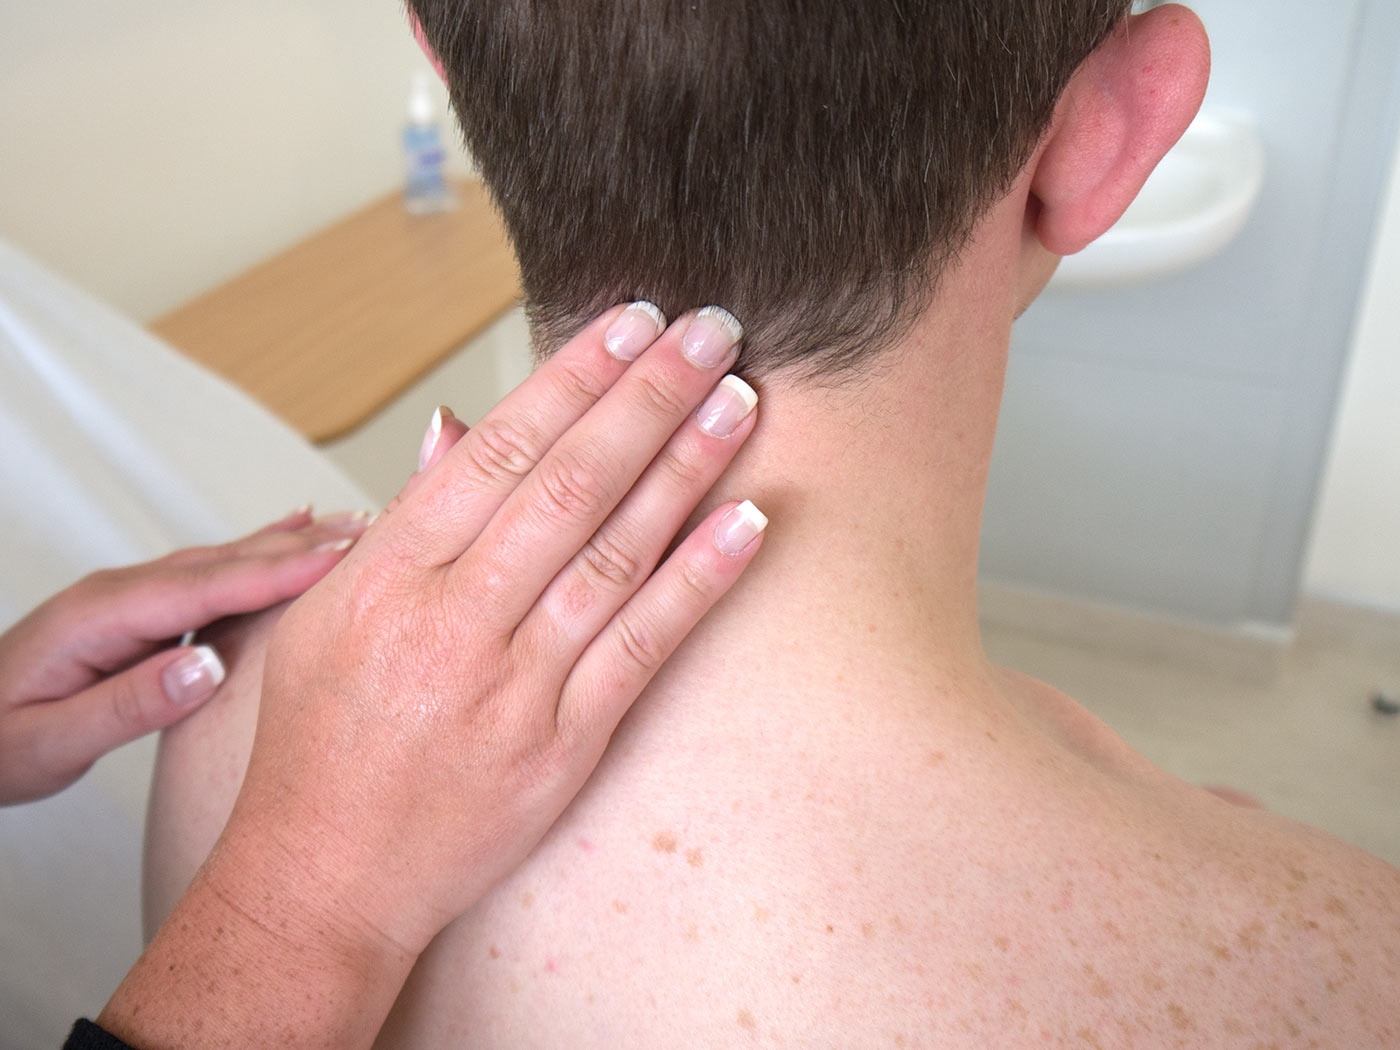 Palpate the occipital lymph nodes